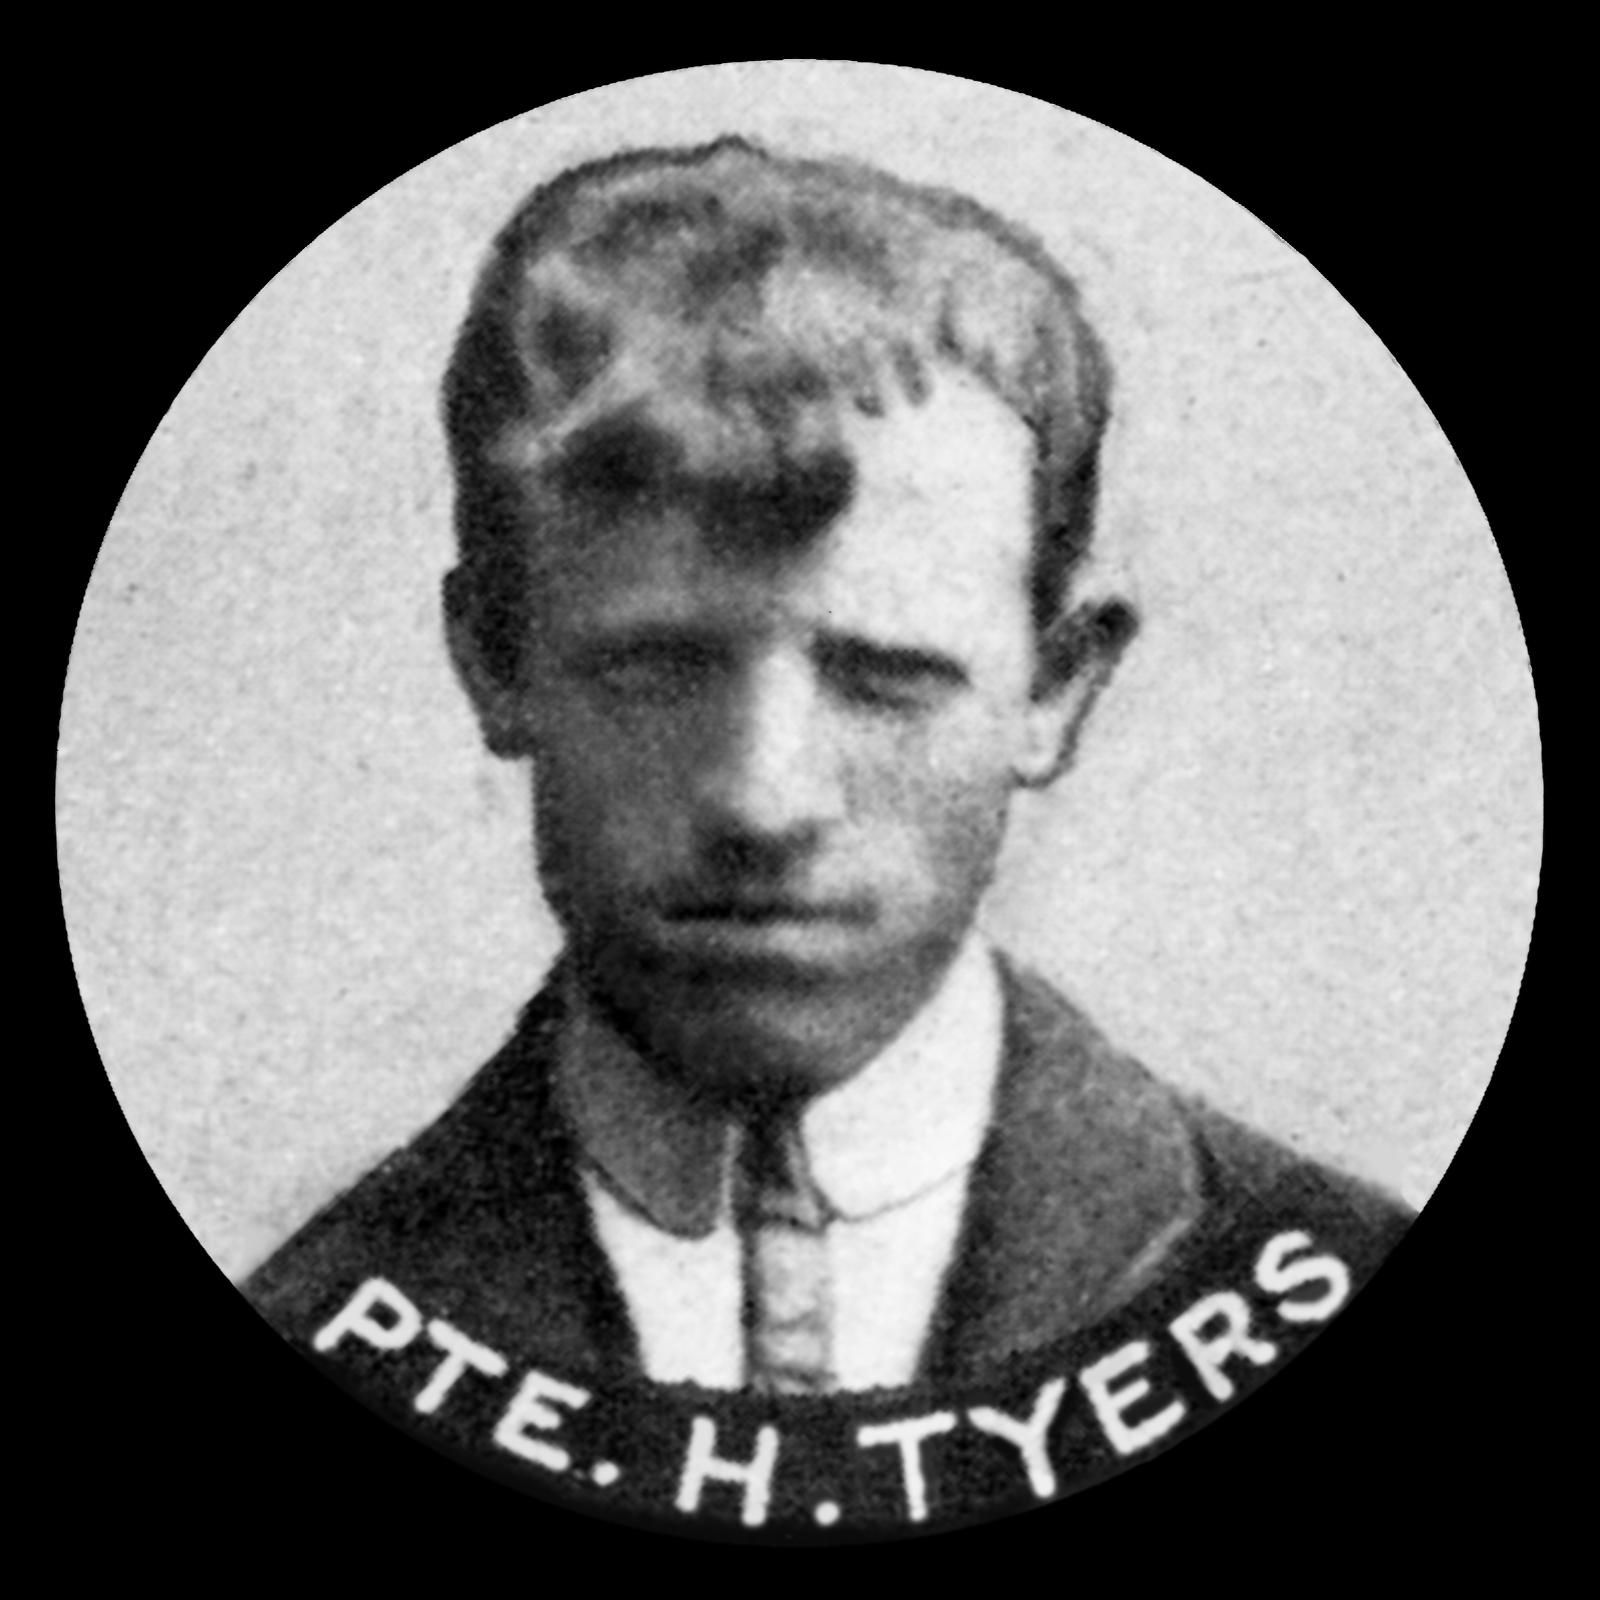 TYERS Harry